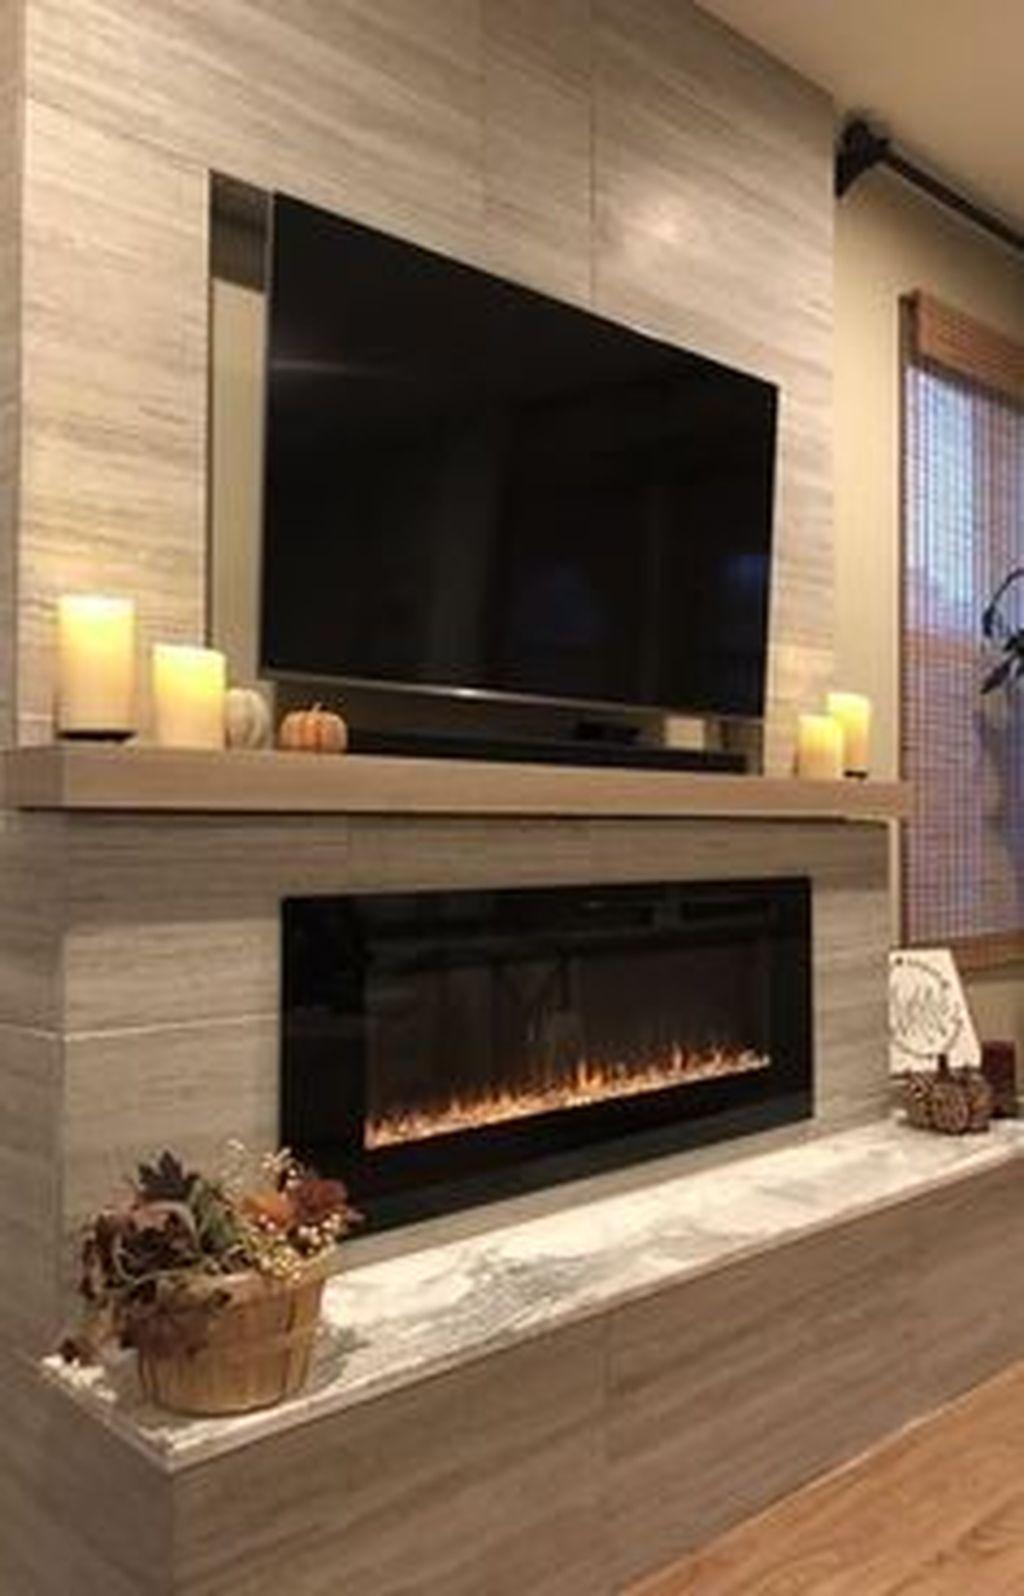 Pin by Kash Sandhu on house stuff  Linear fireplace